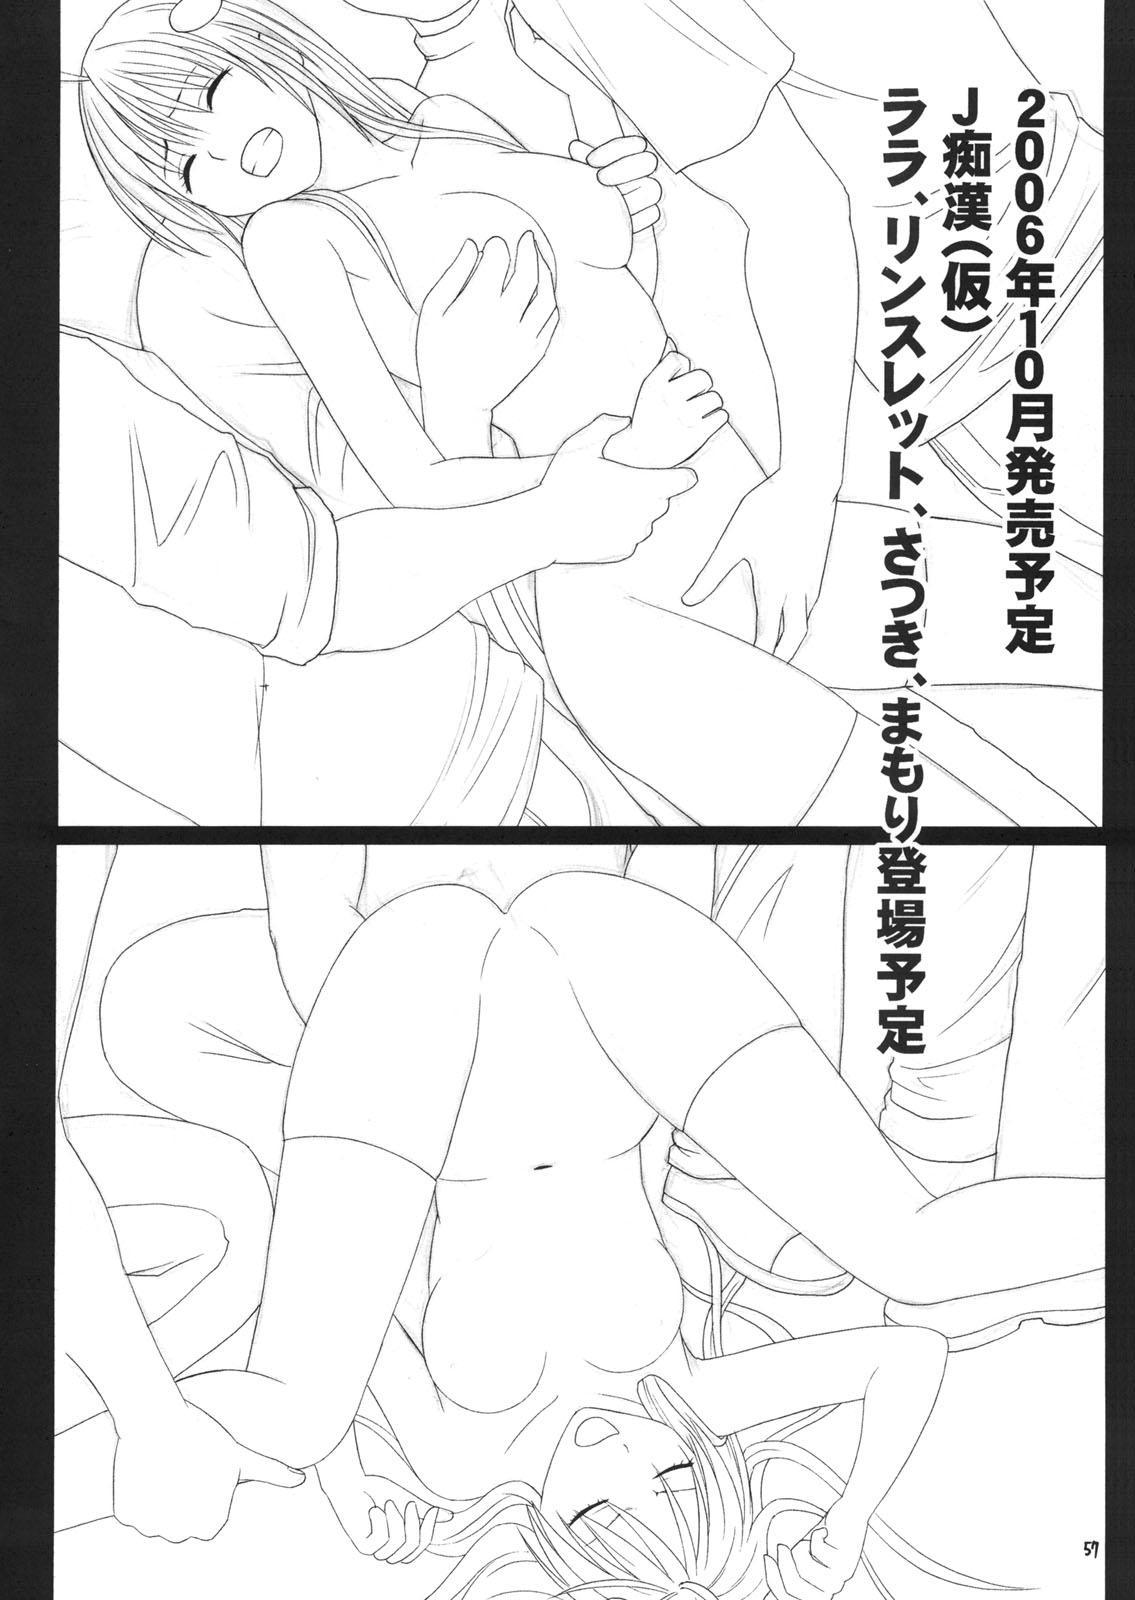 m_e-[Crimson Comics] {Full Color} (To-LOVE-Ru) Selfish (Jap) 61